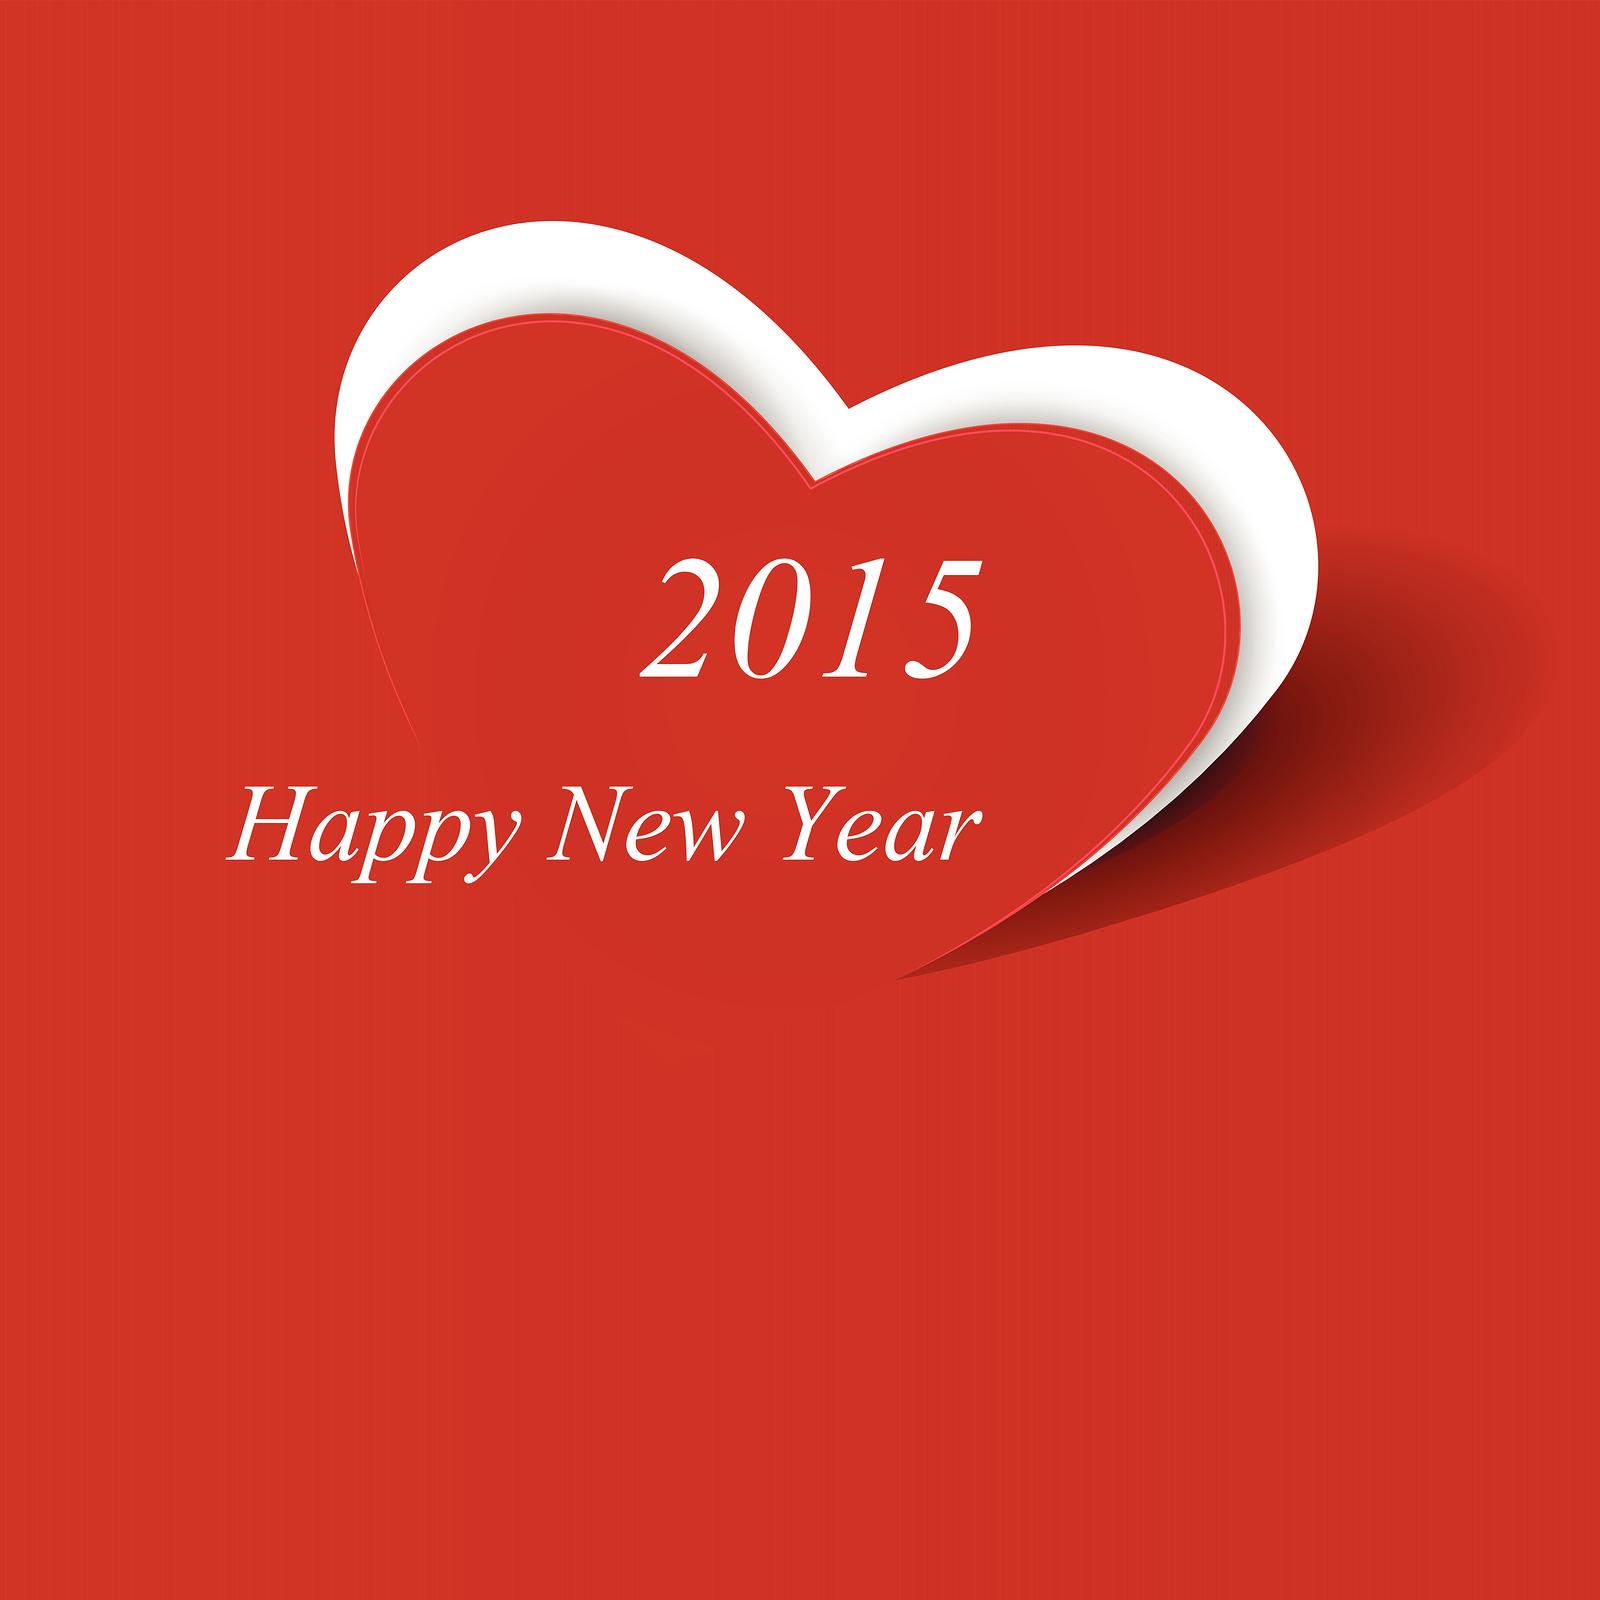 Happy New Year 2015 Image Wallpaper 7901 Wallpaper computer best 1600x1600